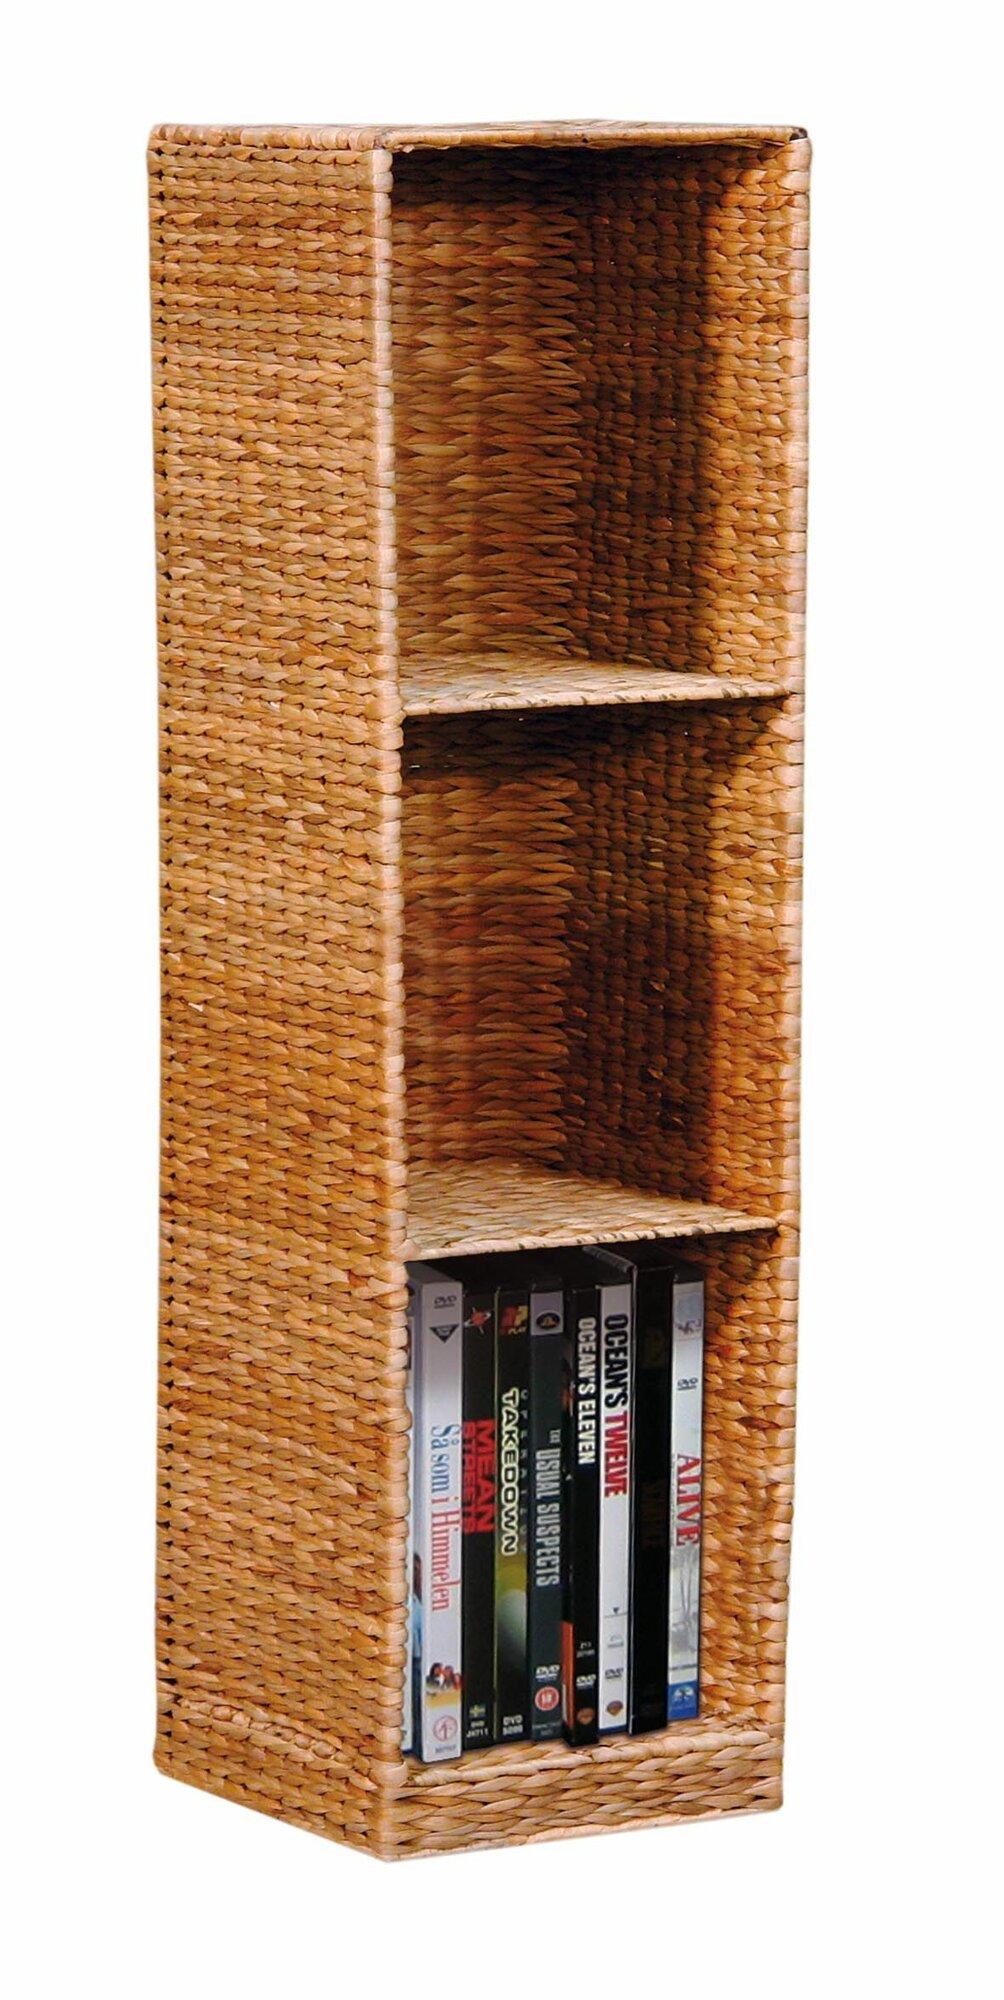 hansen rattan cd dvd regal geilenkirchen germany. Black Bedroom Furniture Sets. Home Design Ideas